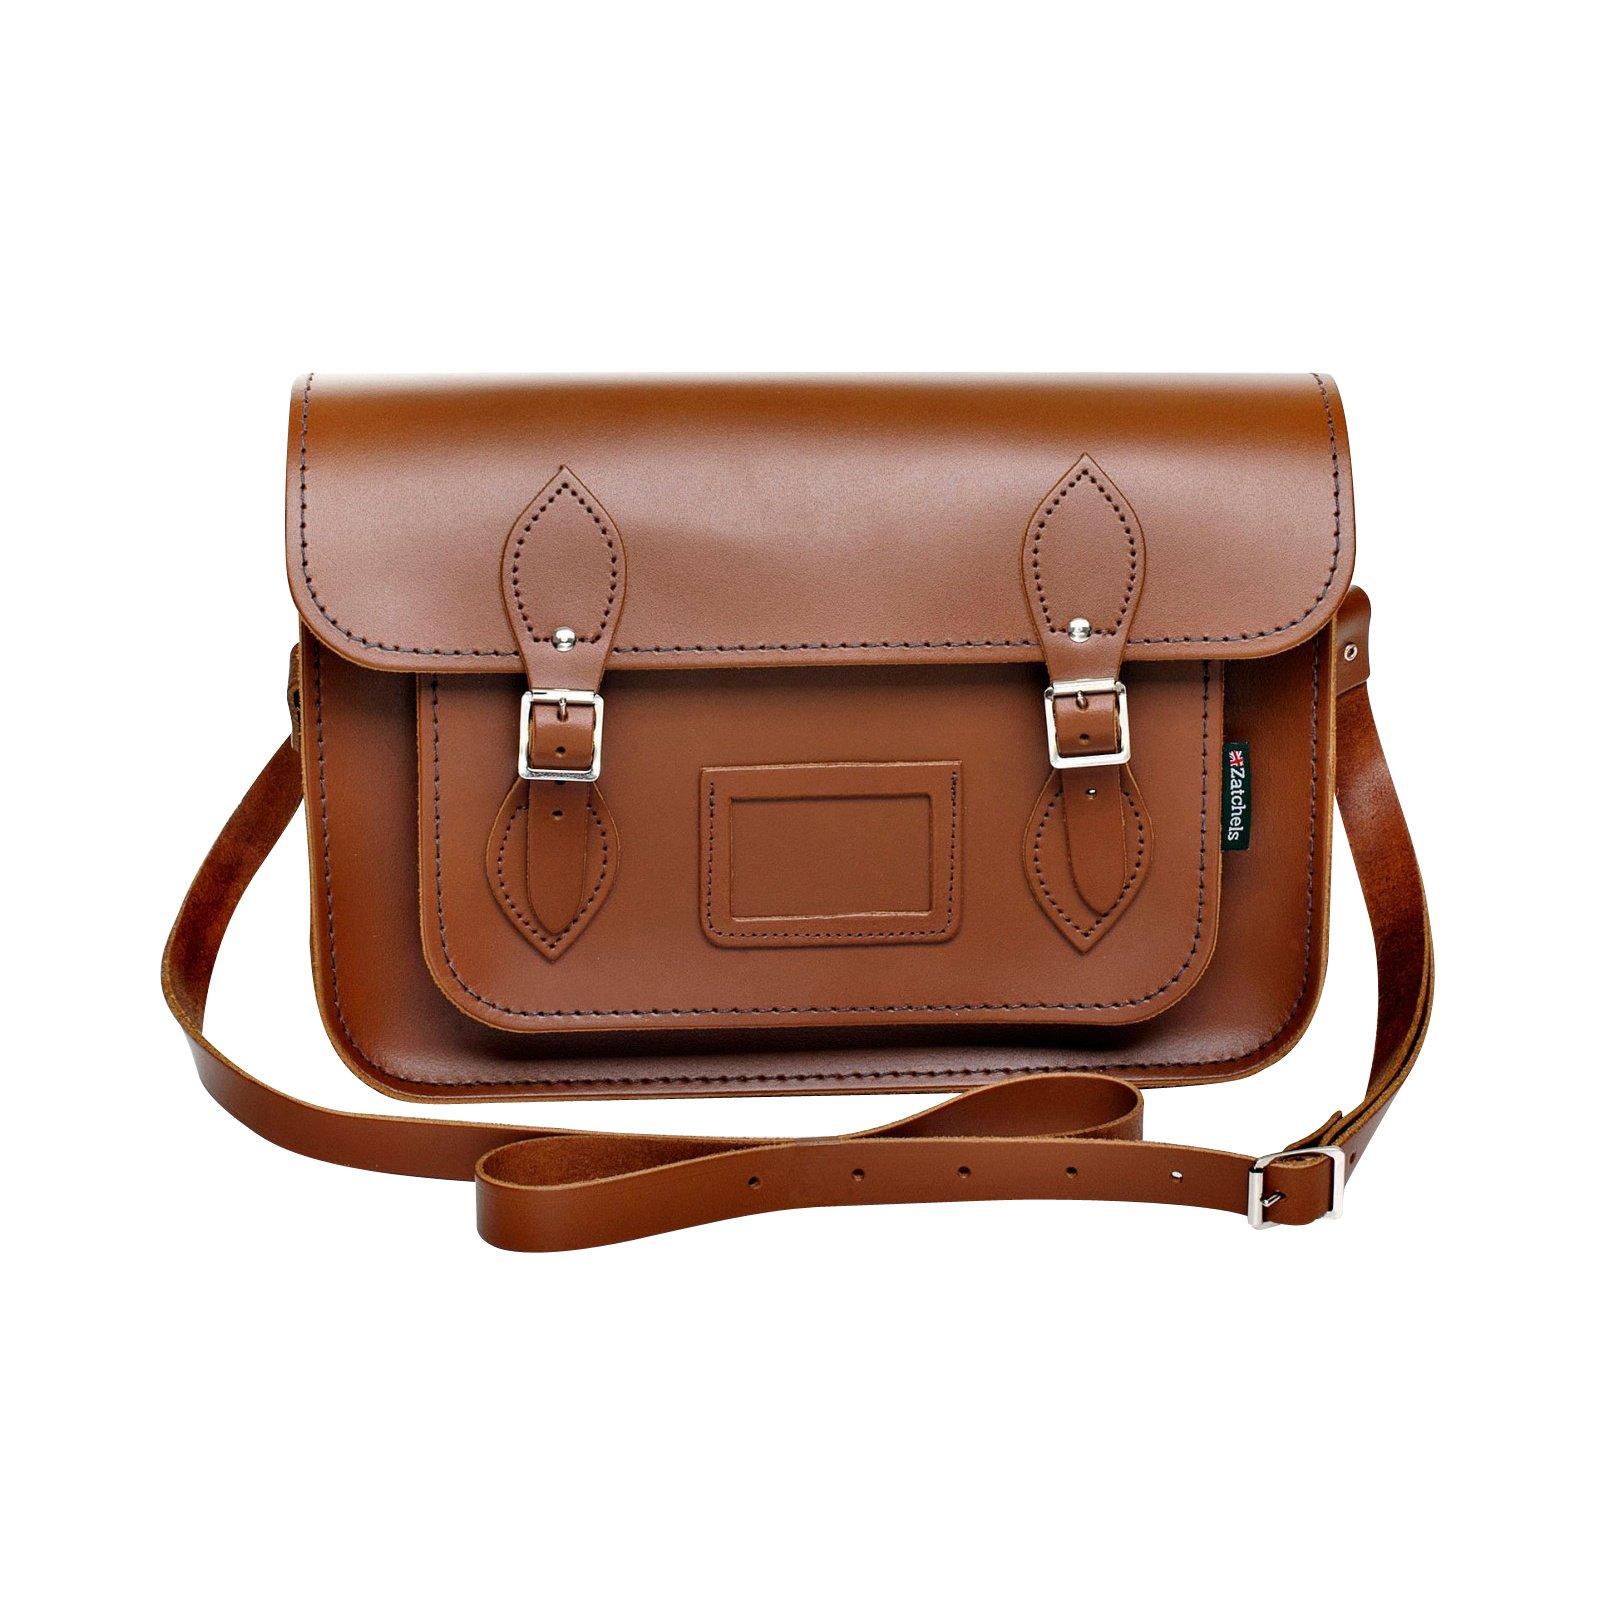 Zatchels Womens/Ladies Handcrafted Leather Satchel Bag (British Made) (13in) (Chestnut)